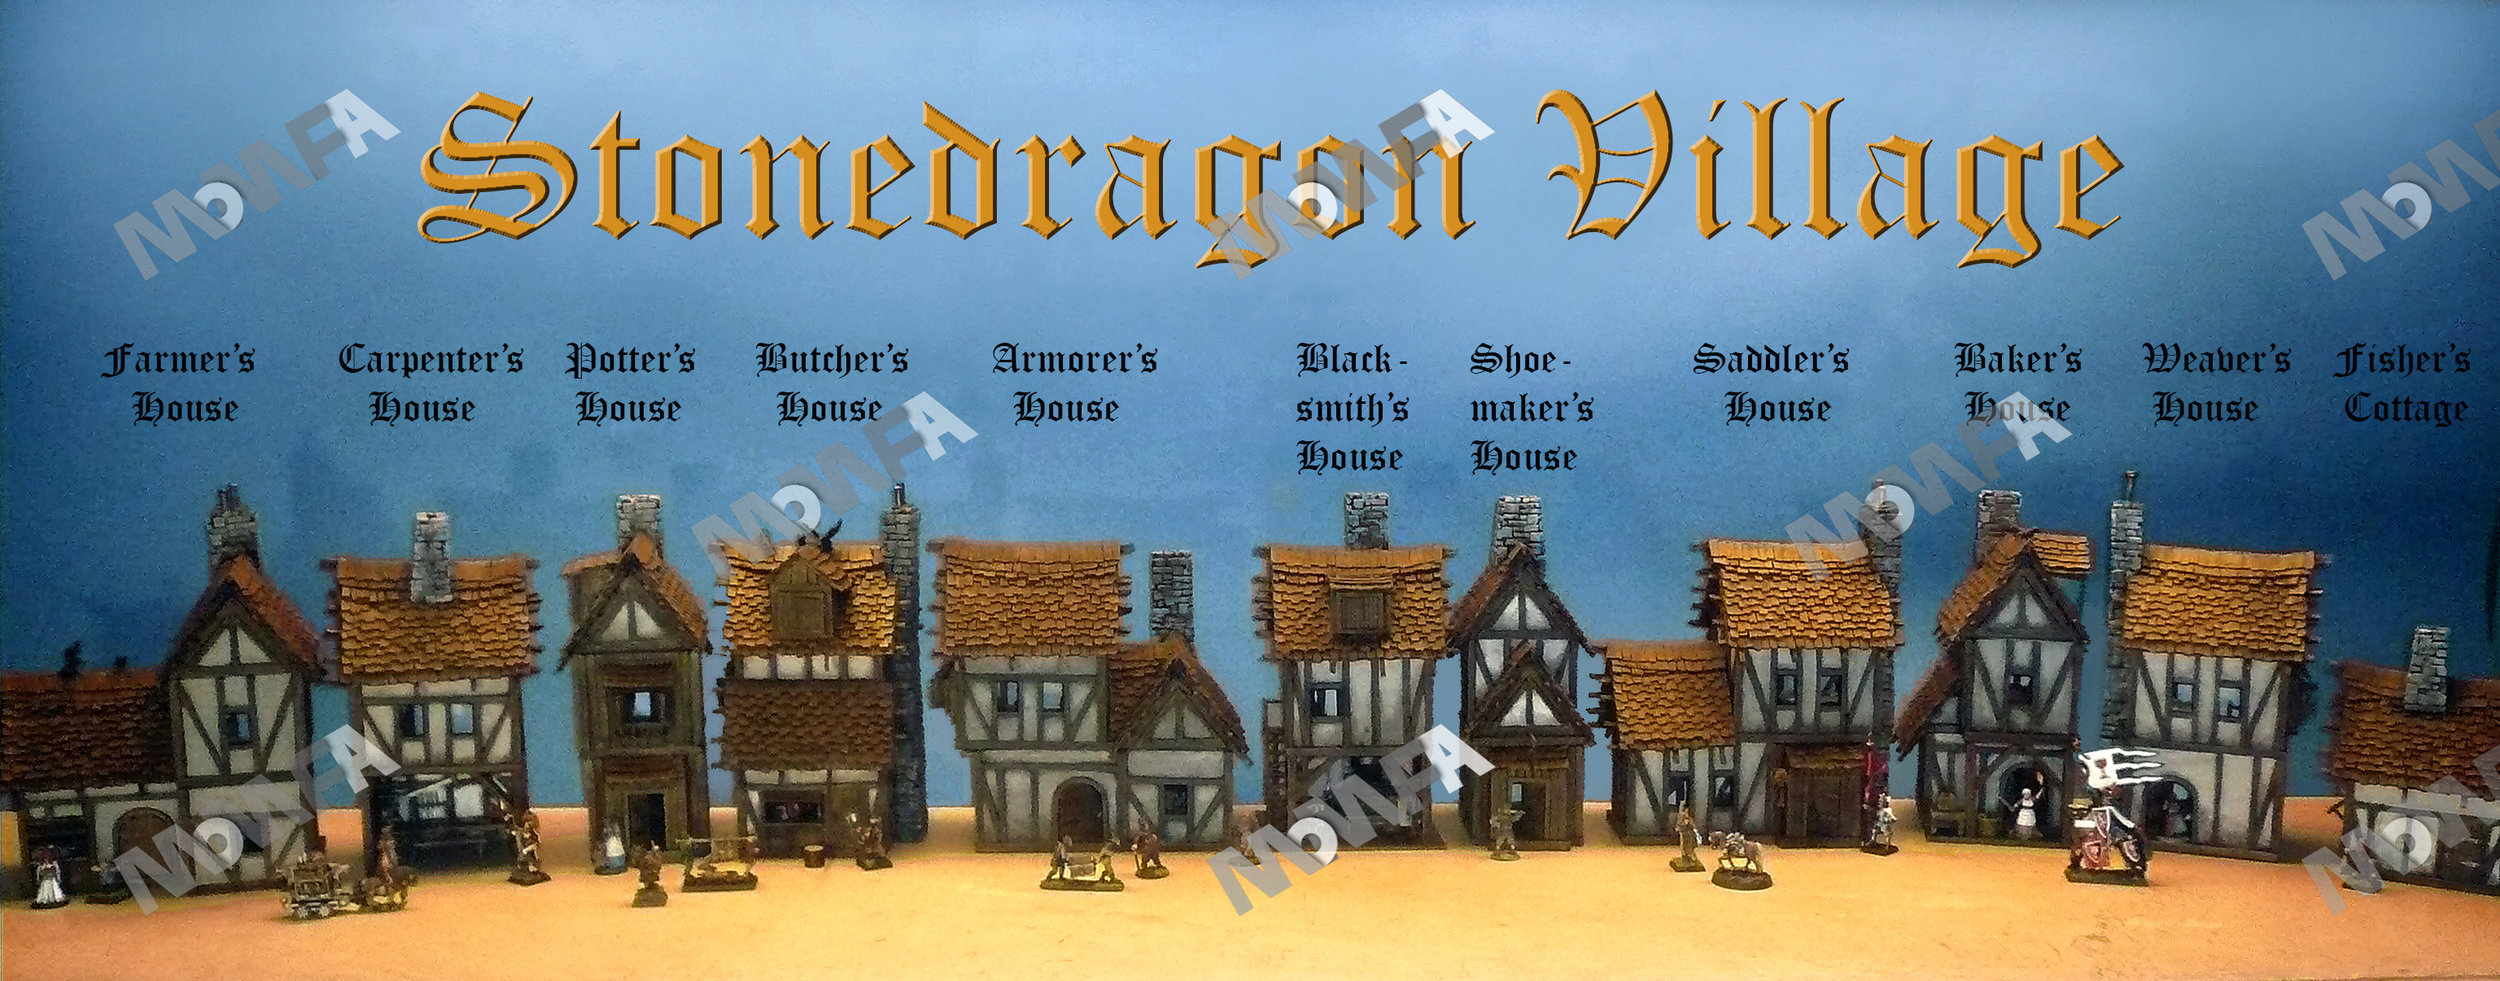 Stonedragon Village wm.jpg